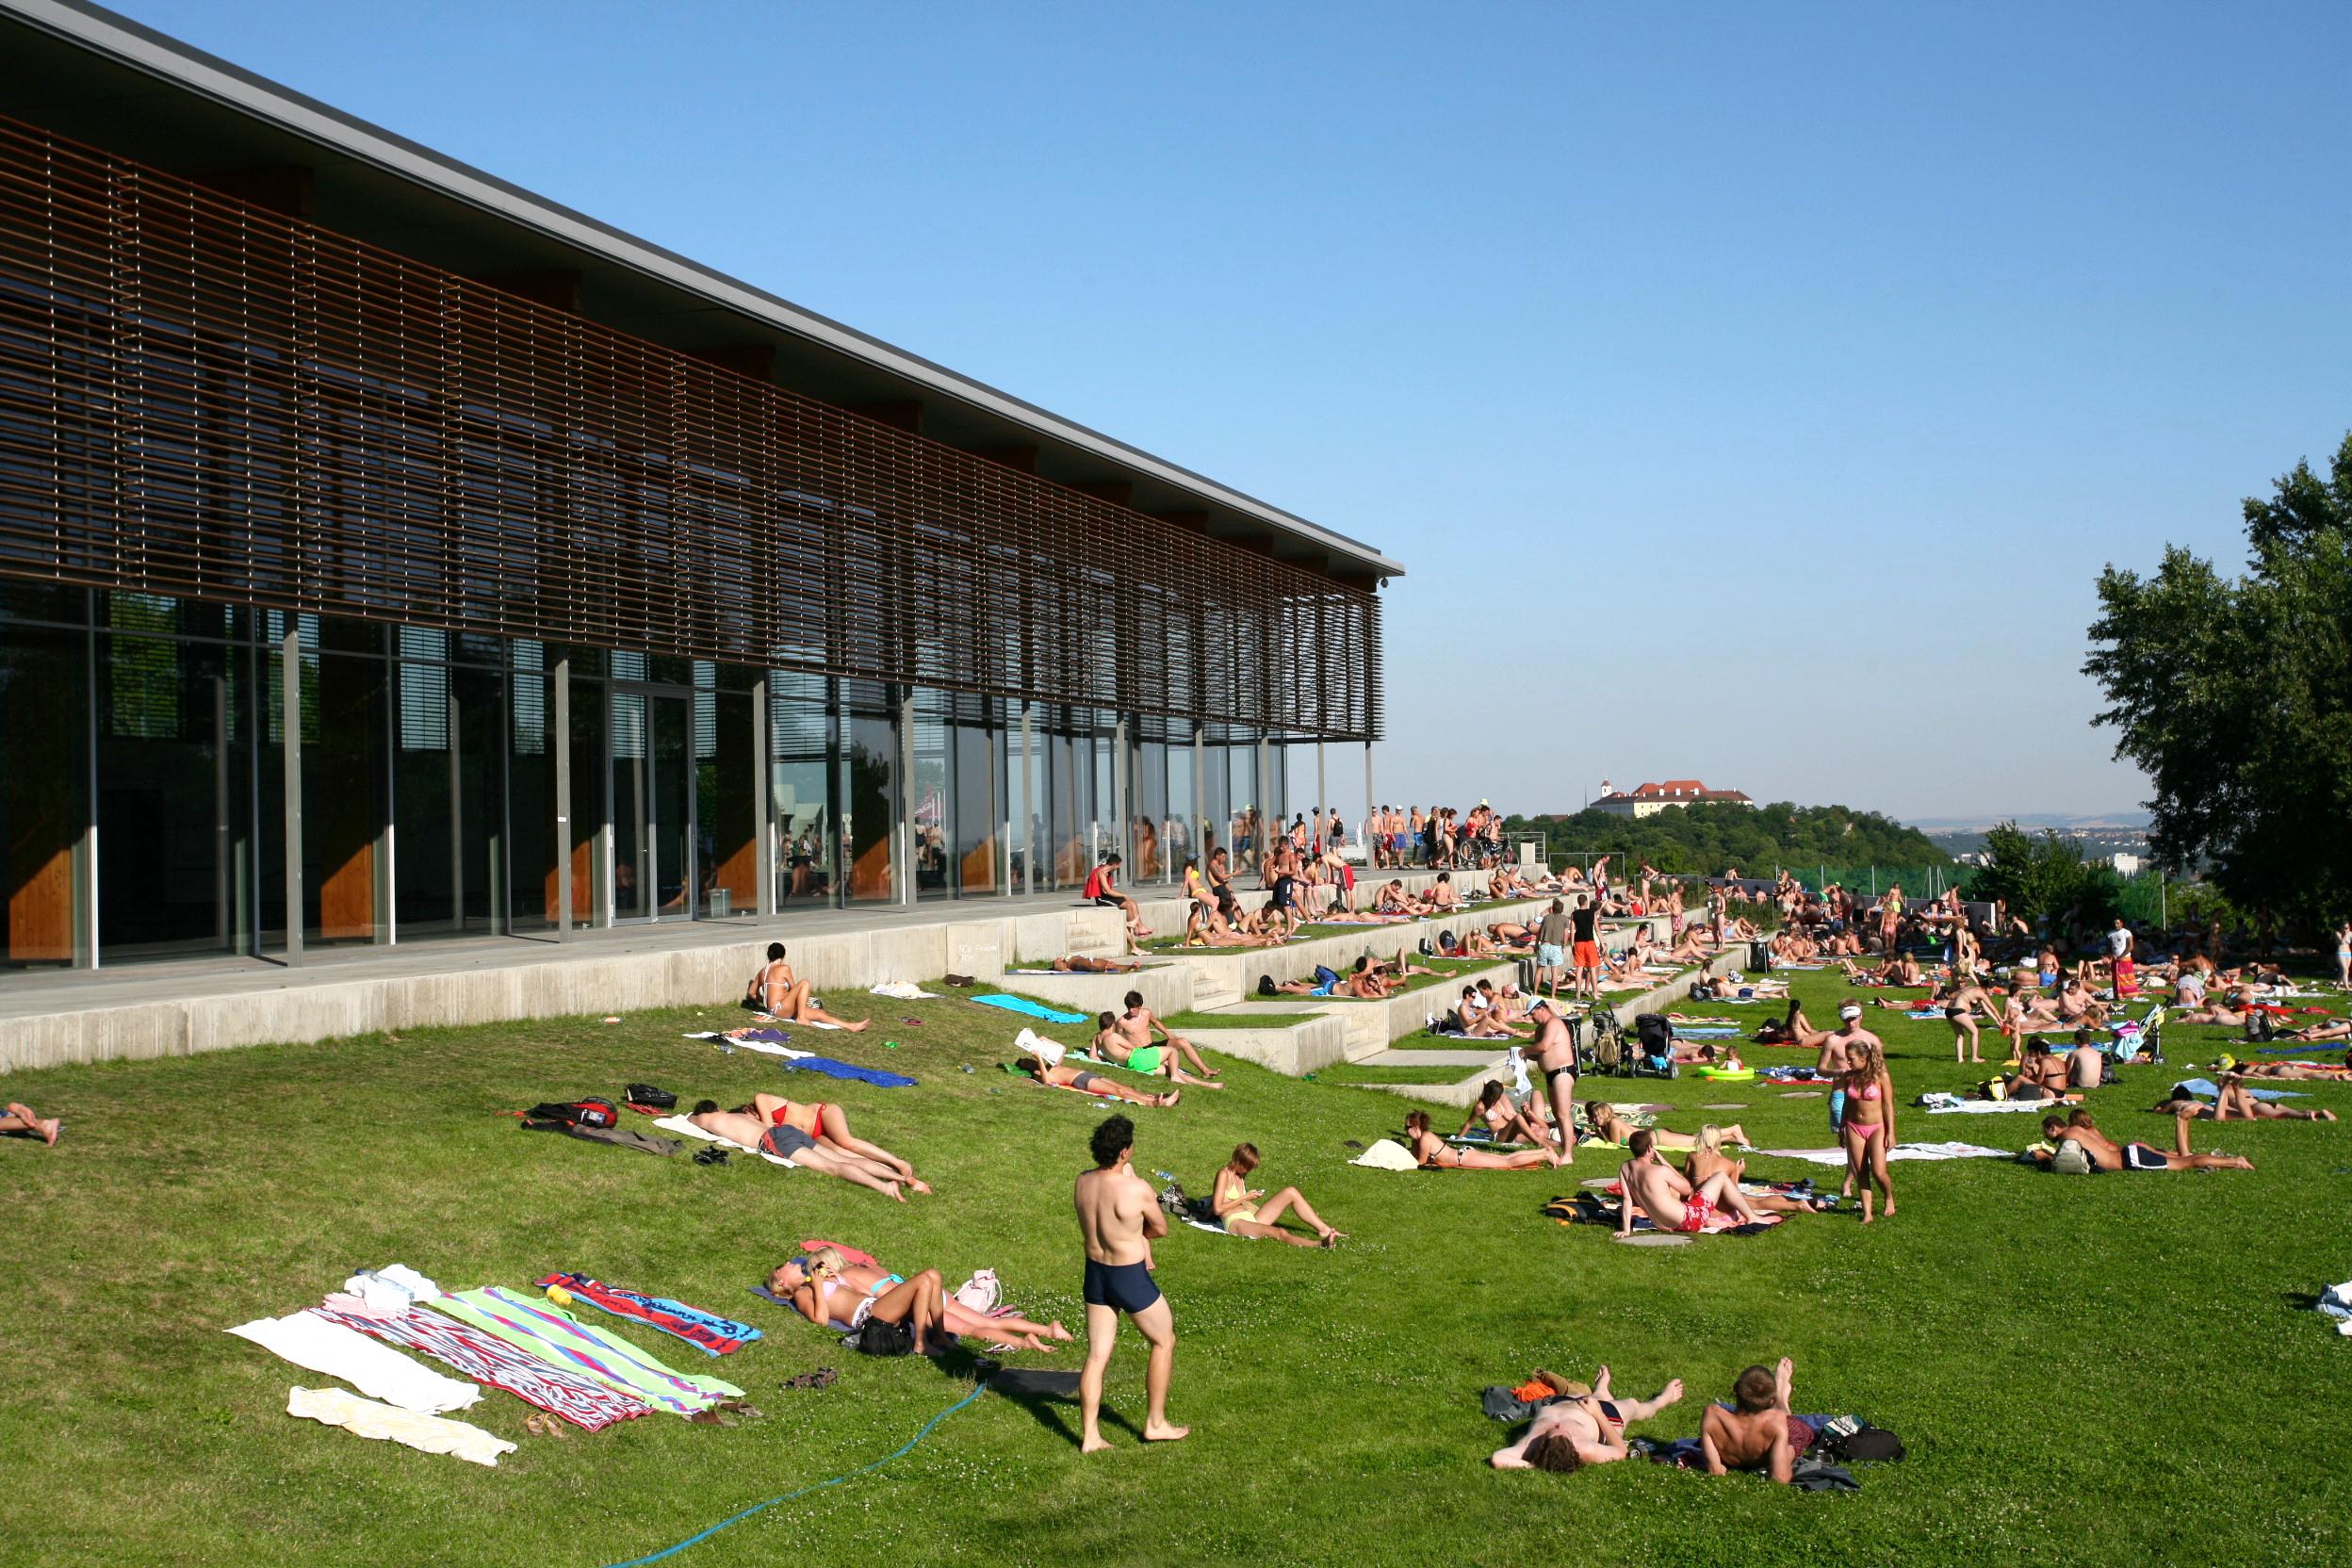 Sport-und Erholungskomplex Kuhberg, David Židlický